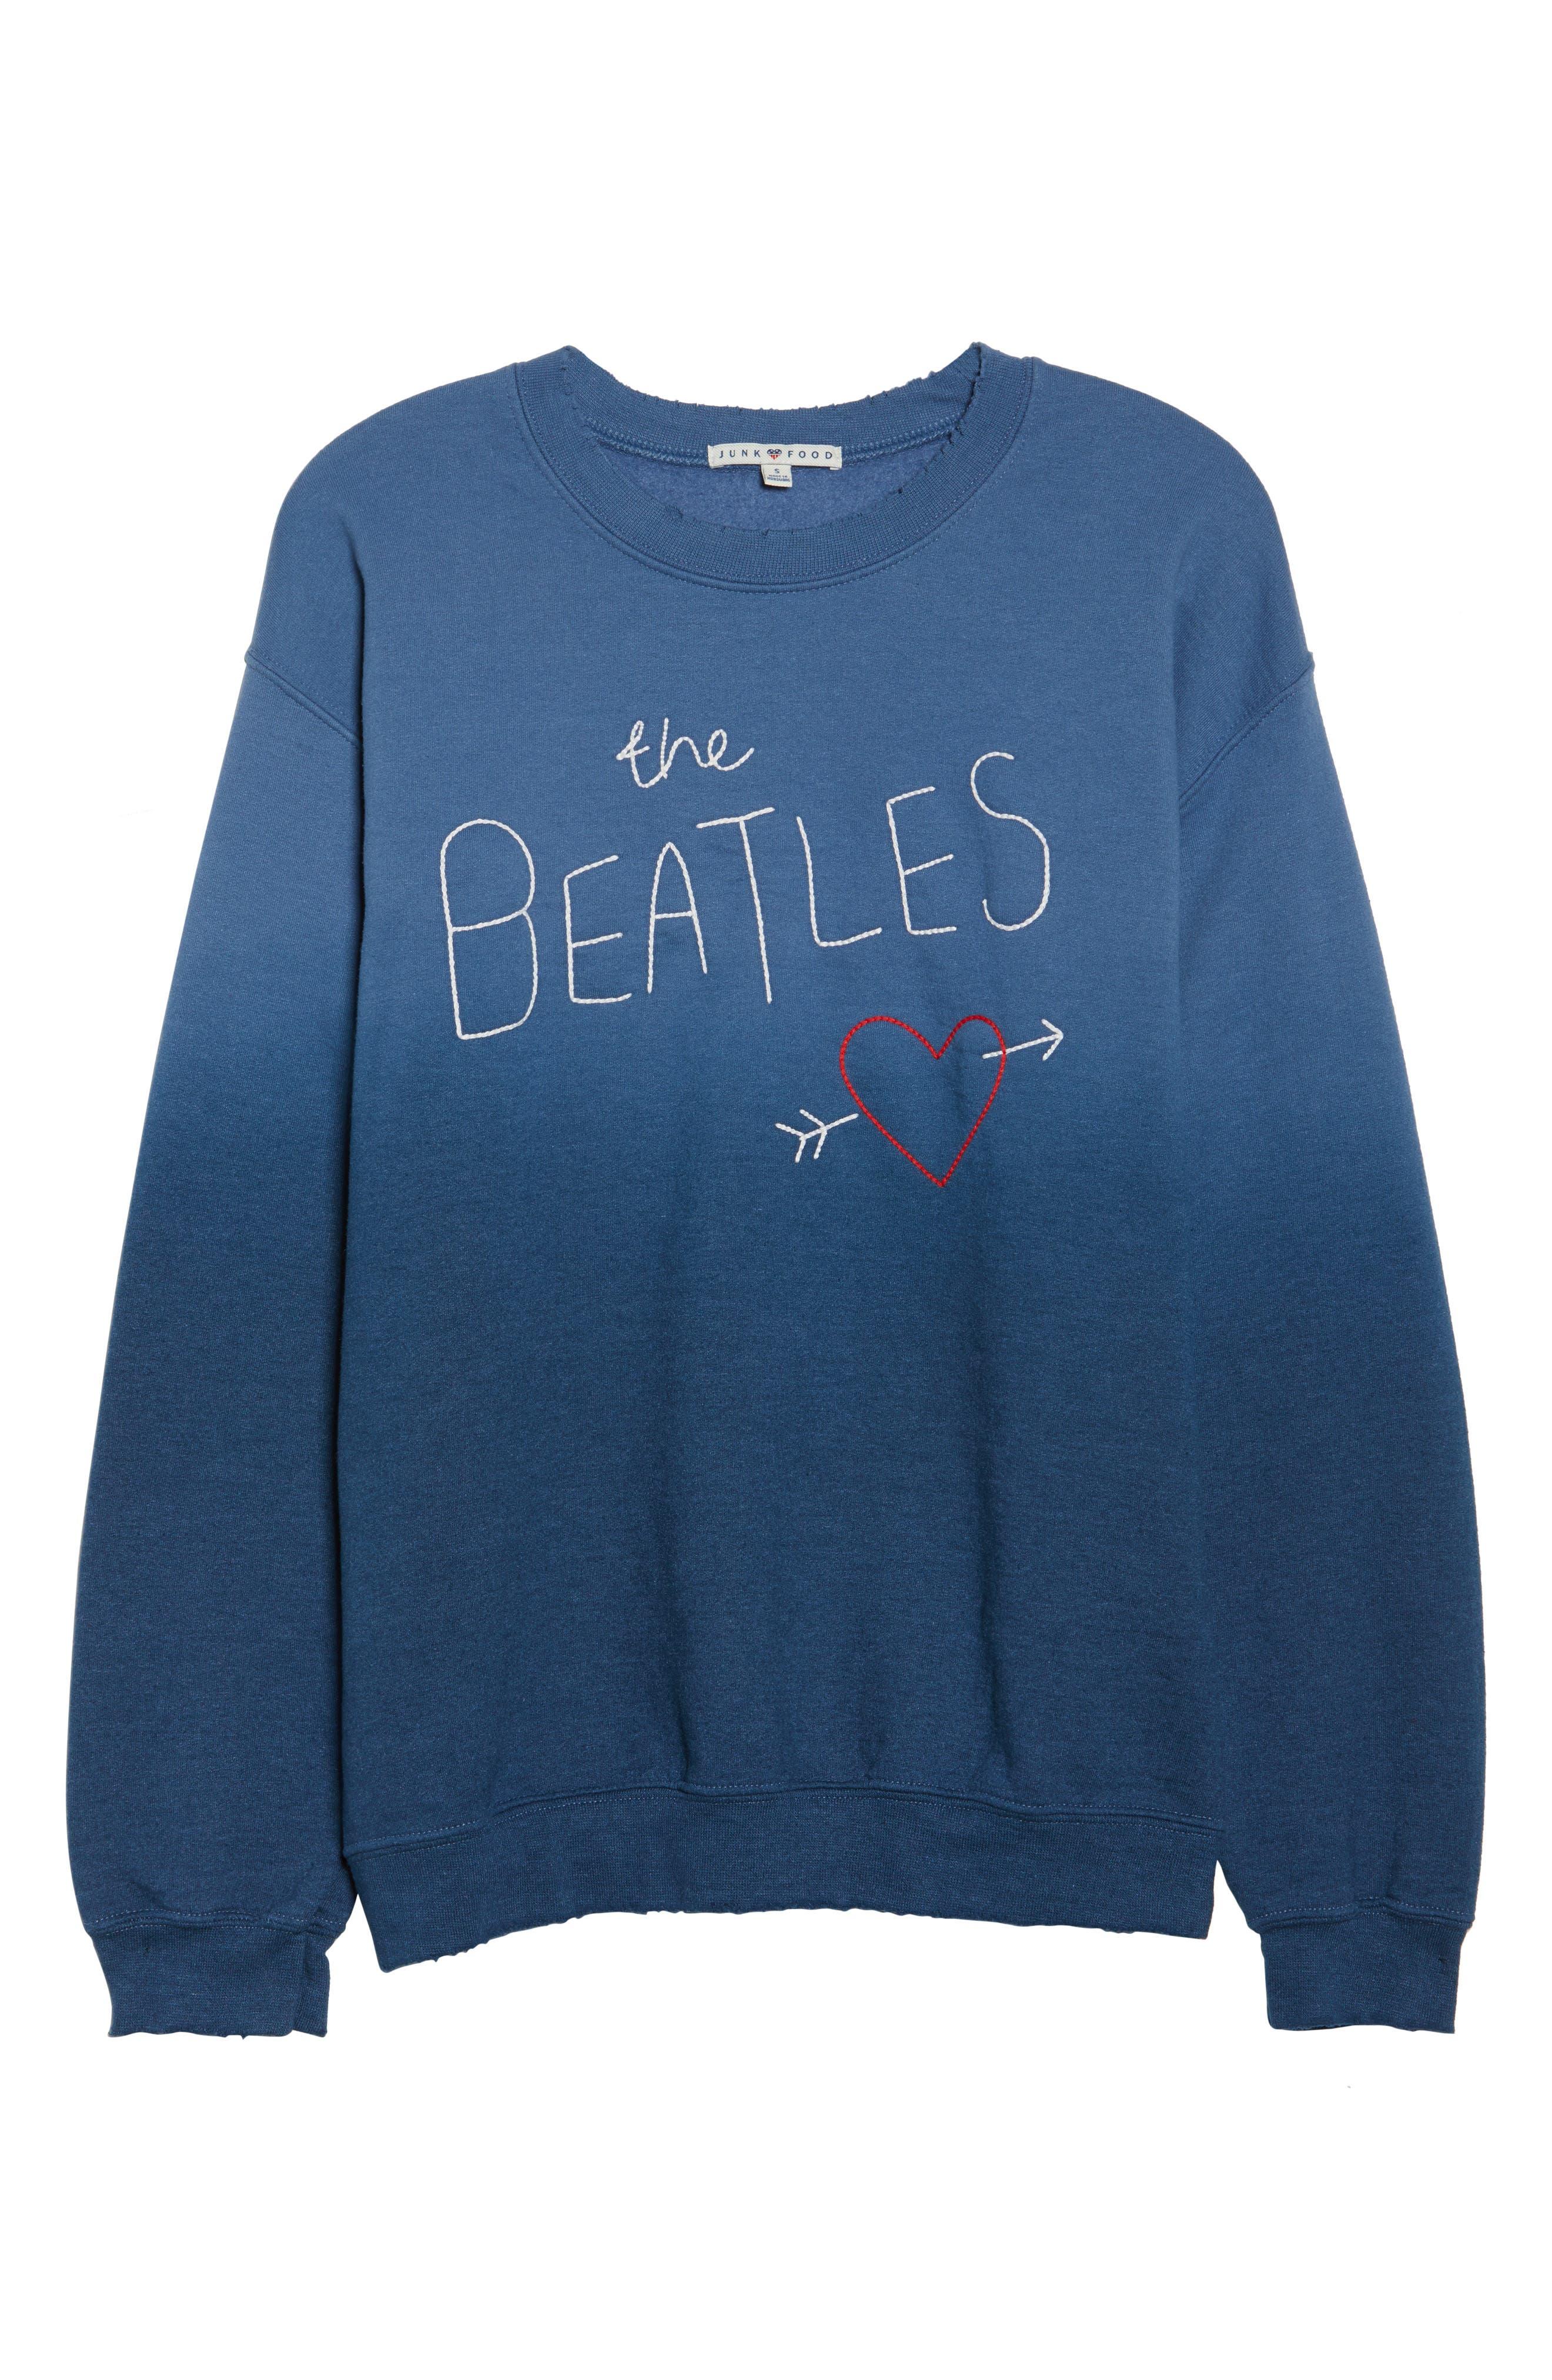 The Beatles Ombré Sweatshirt,                             Alternate thumbnail 4, color,                             True Navy